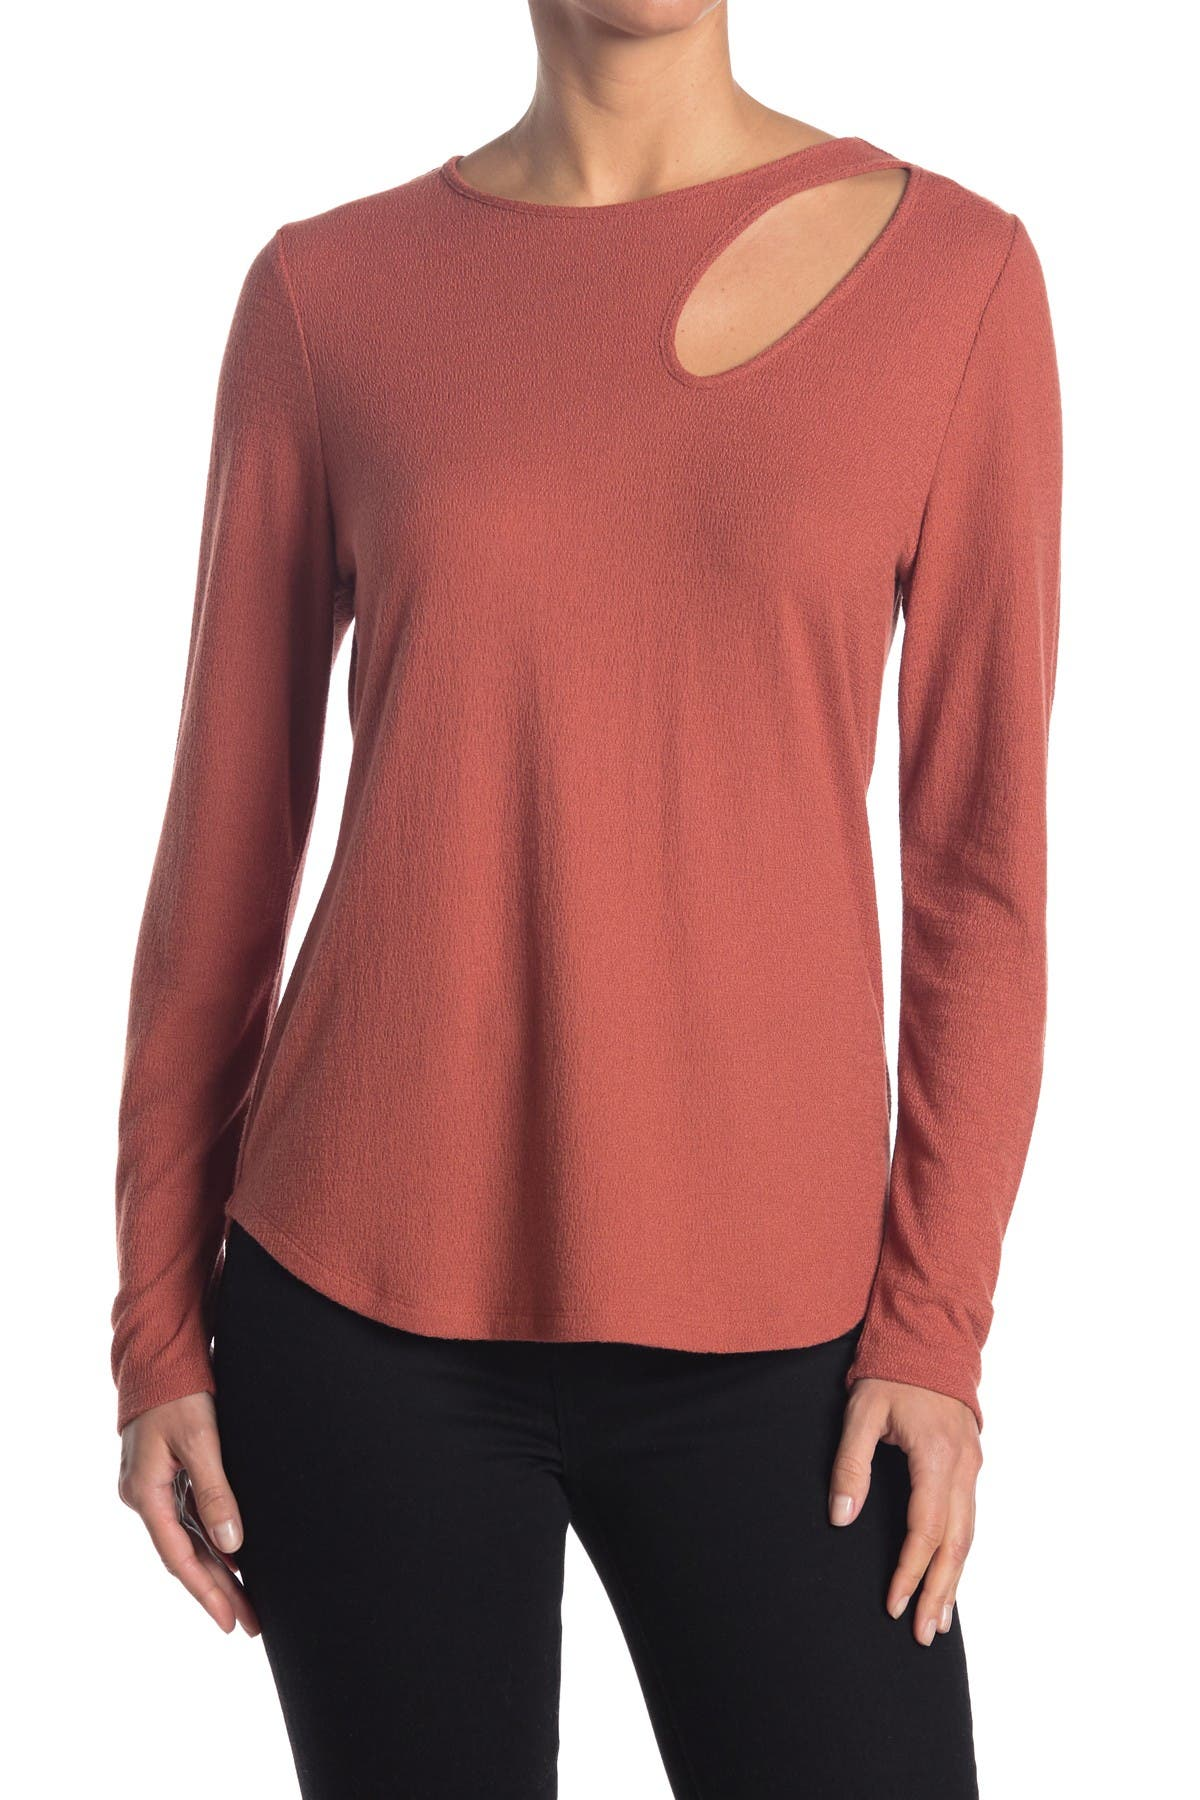 Status by Chenault Womens Smock Neck Textured Tee Tank Top Shirt Plus BHFO 8301